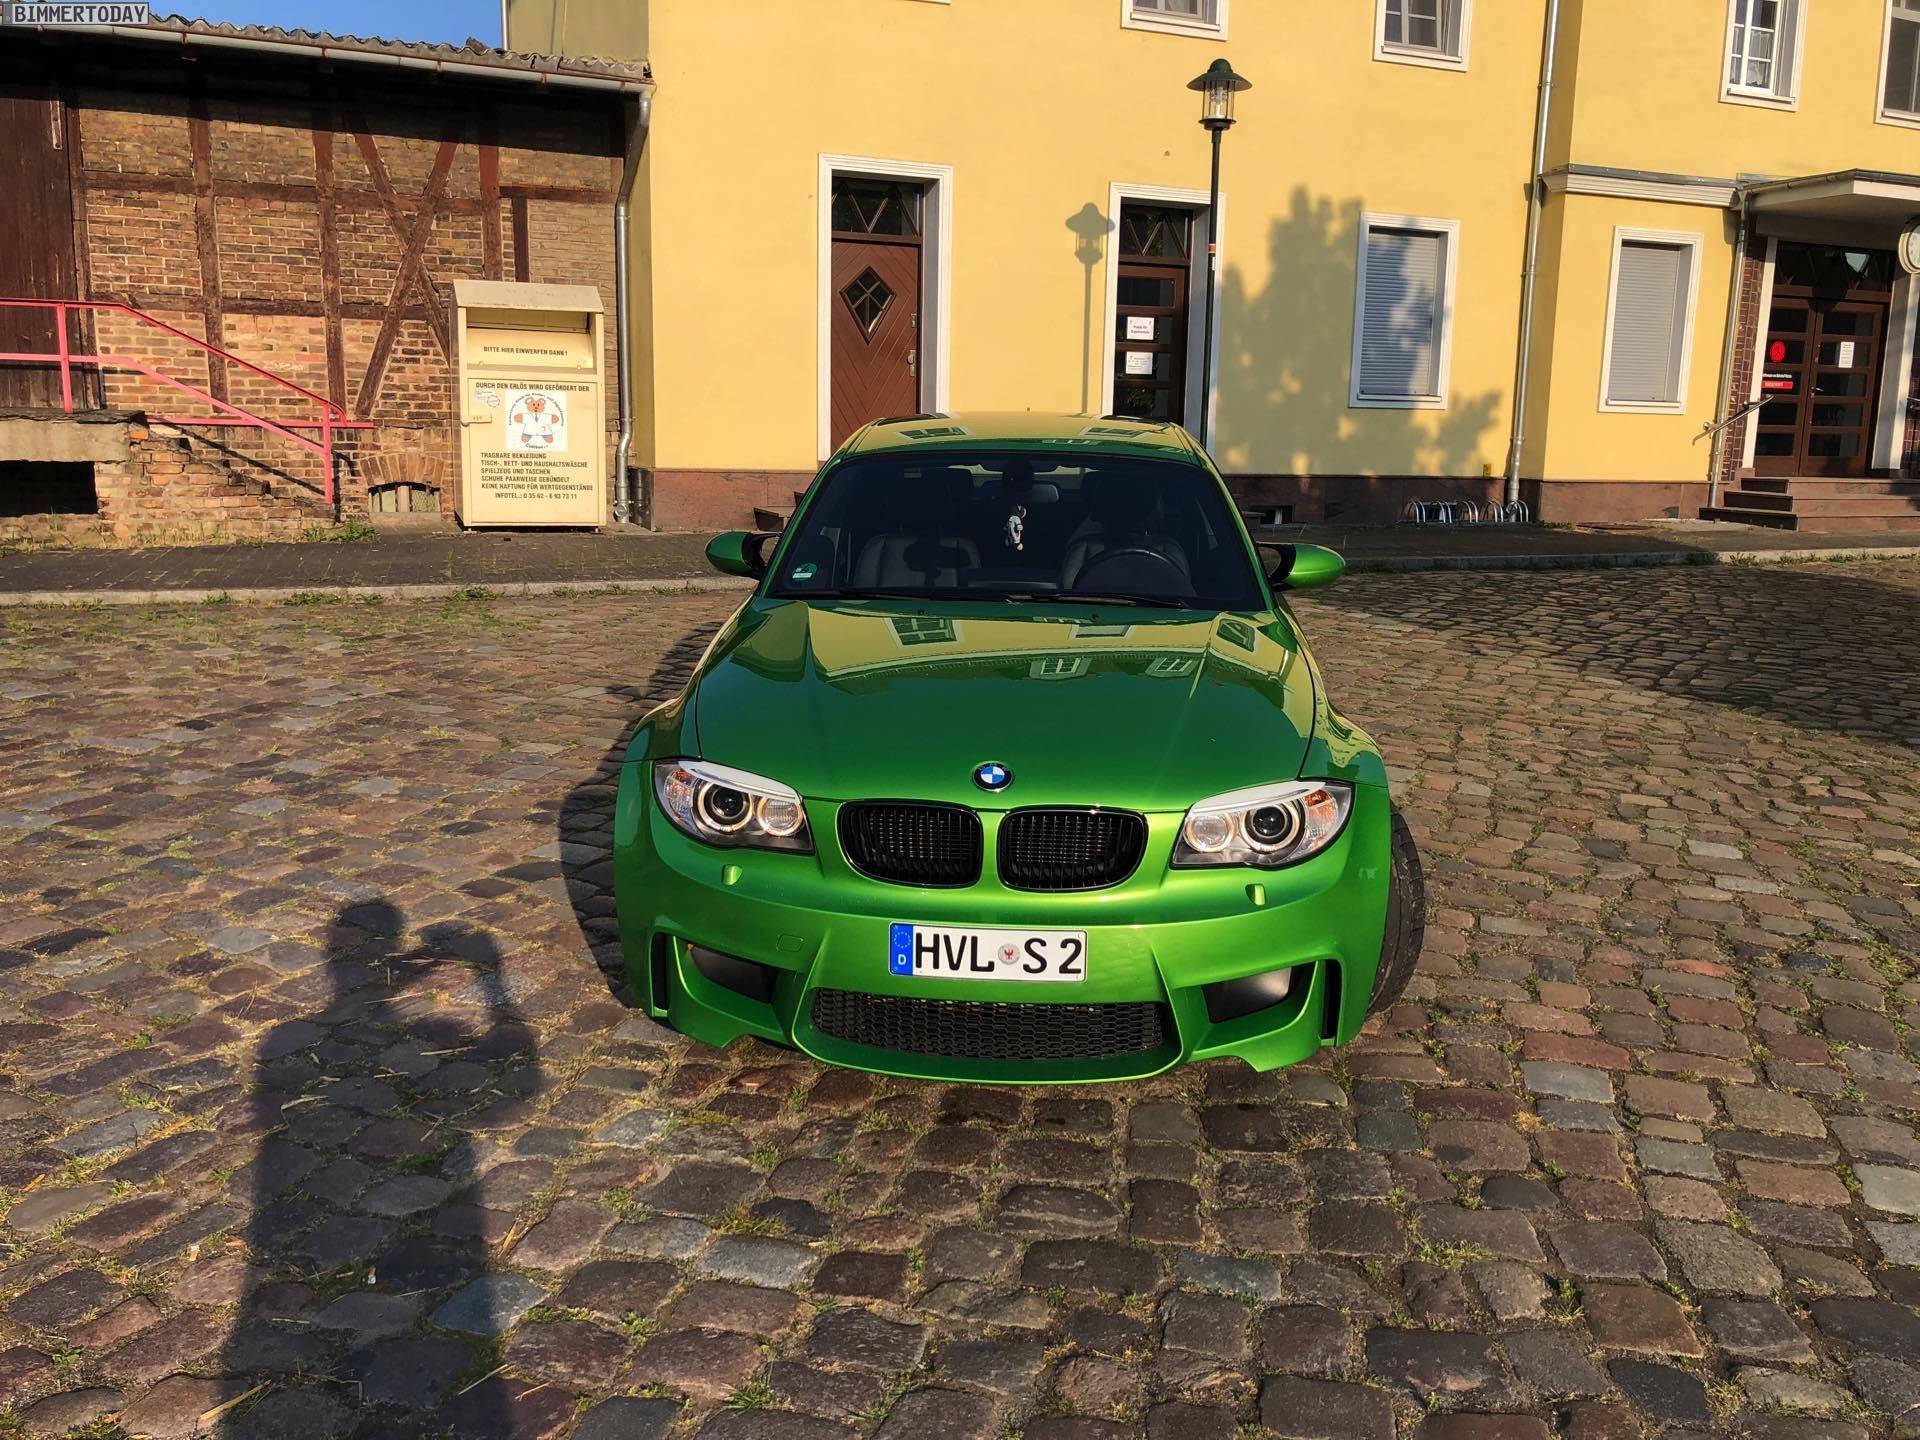 BMW 1M Green mamba java green 06